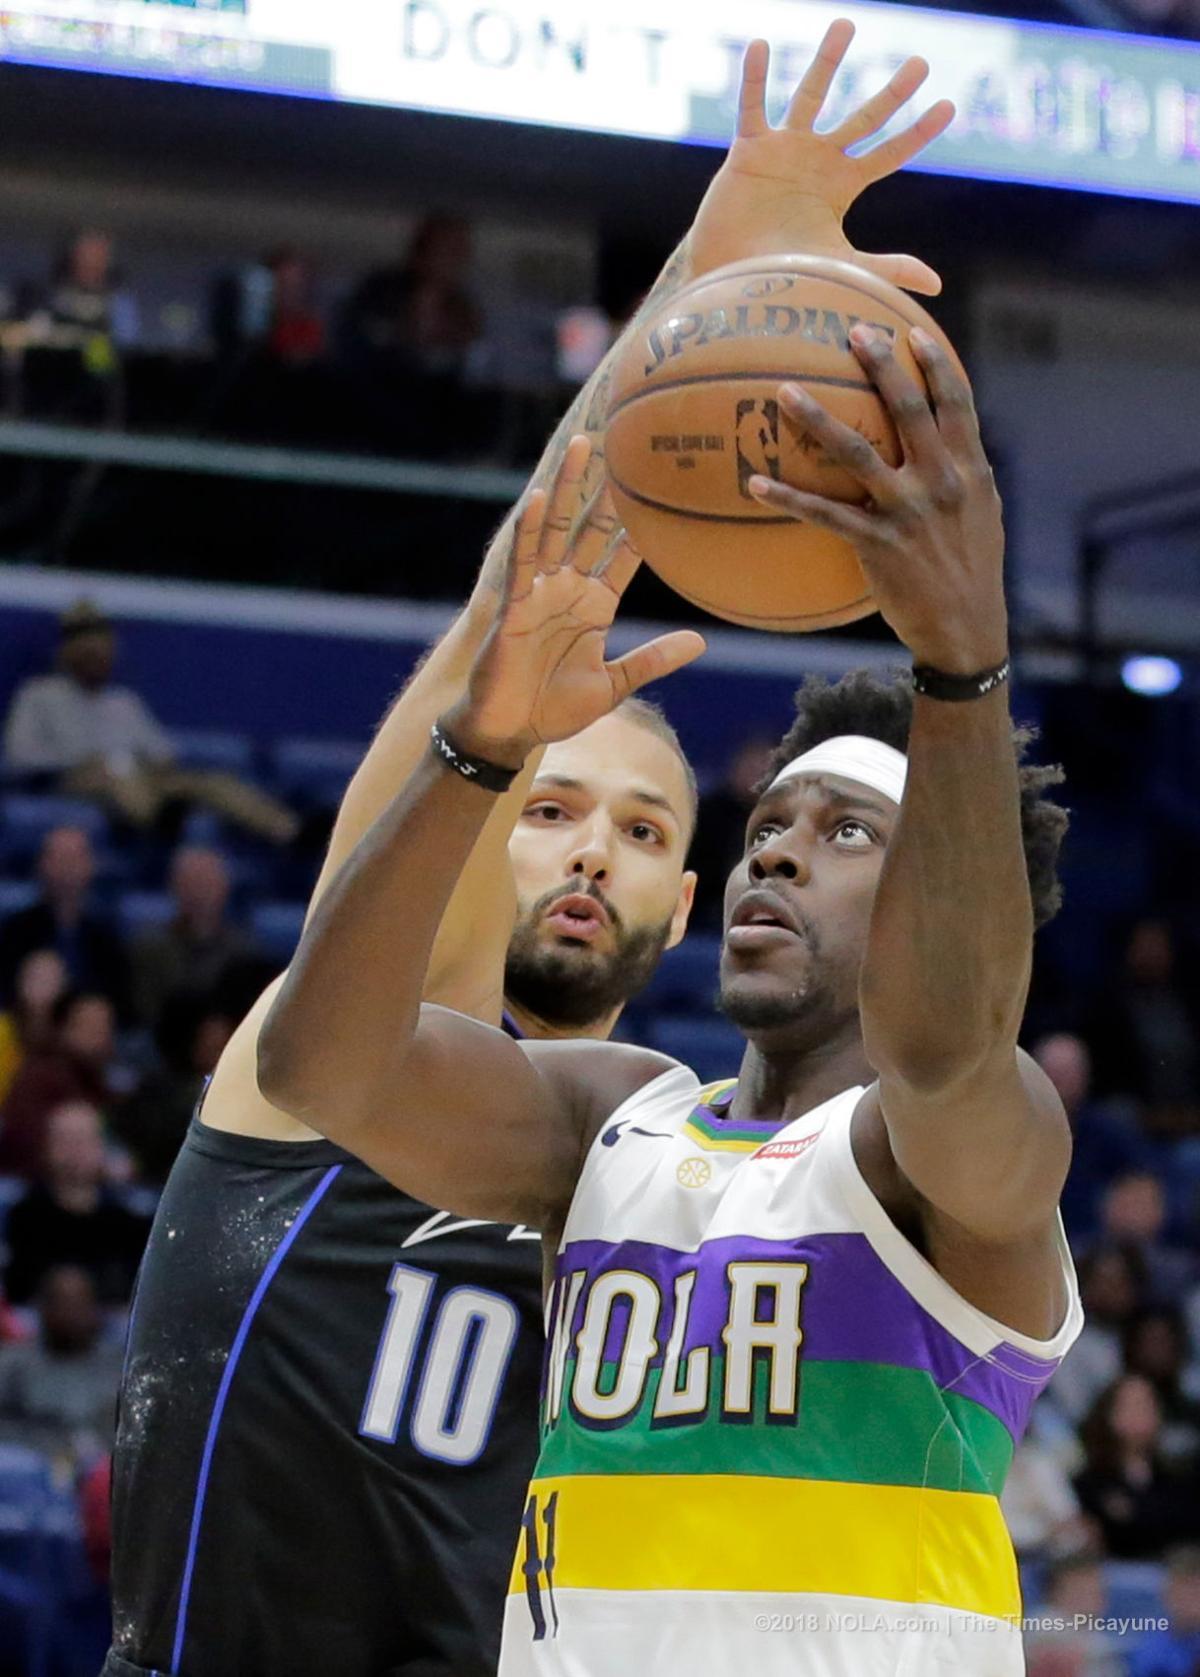 New Orleans Pelicans vs. Orlando Magic Tues., Feb. 12, 2019